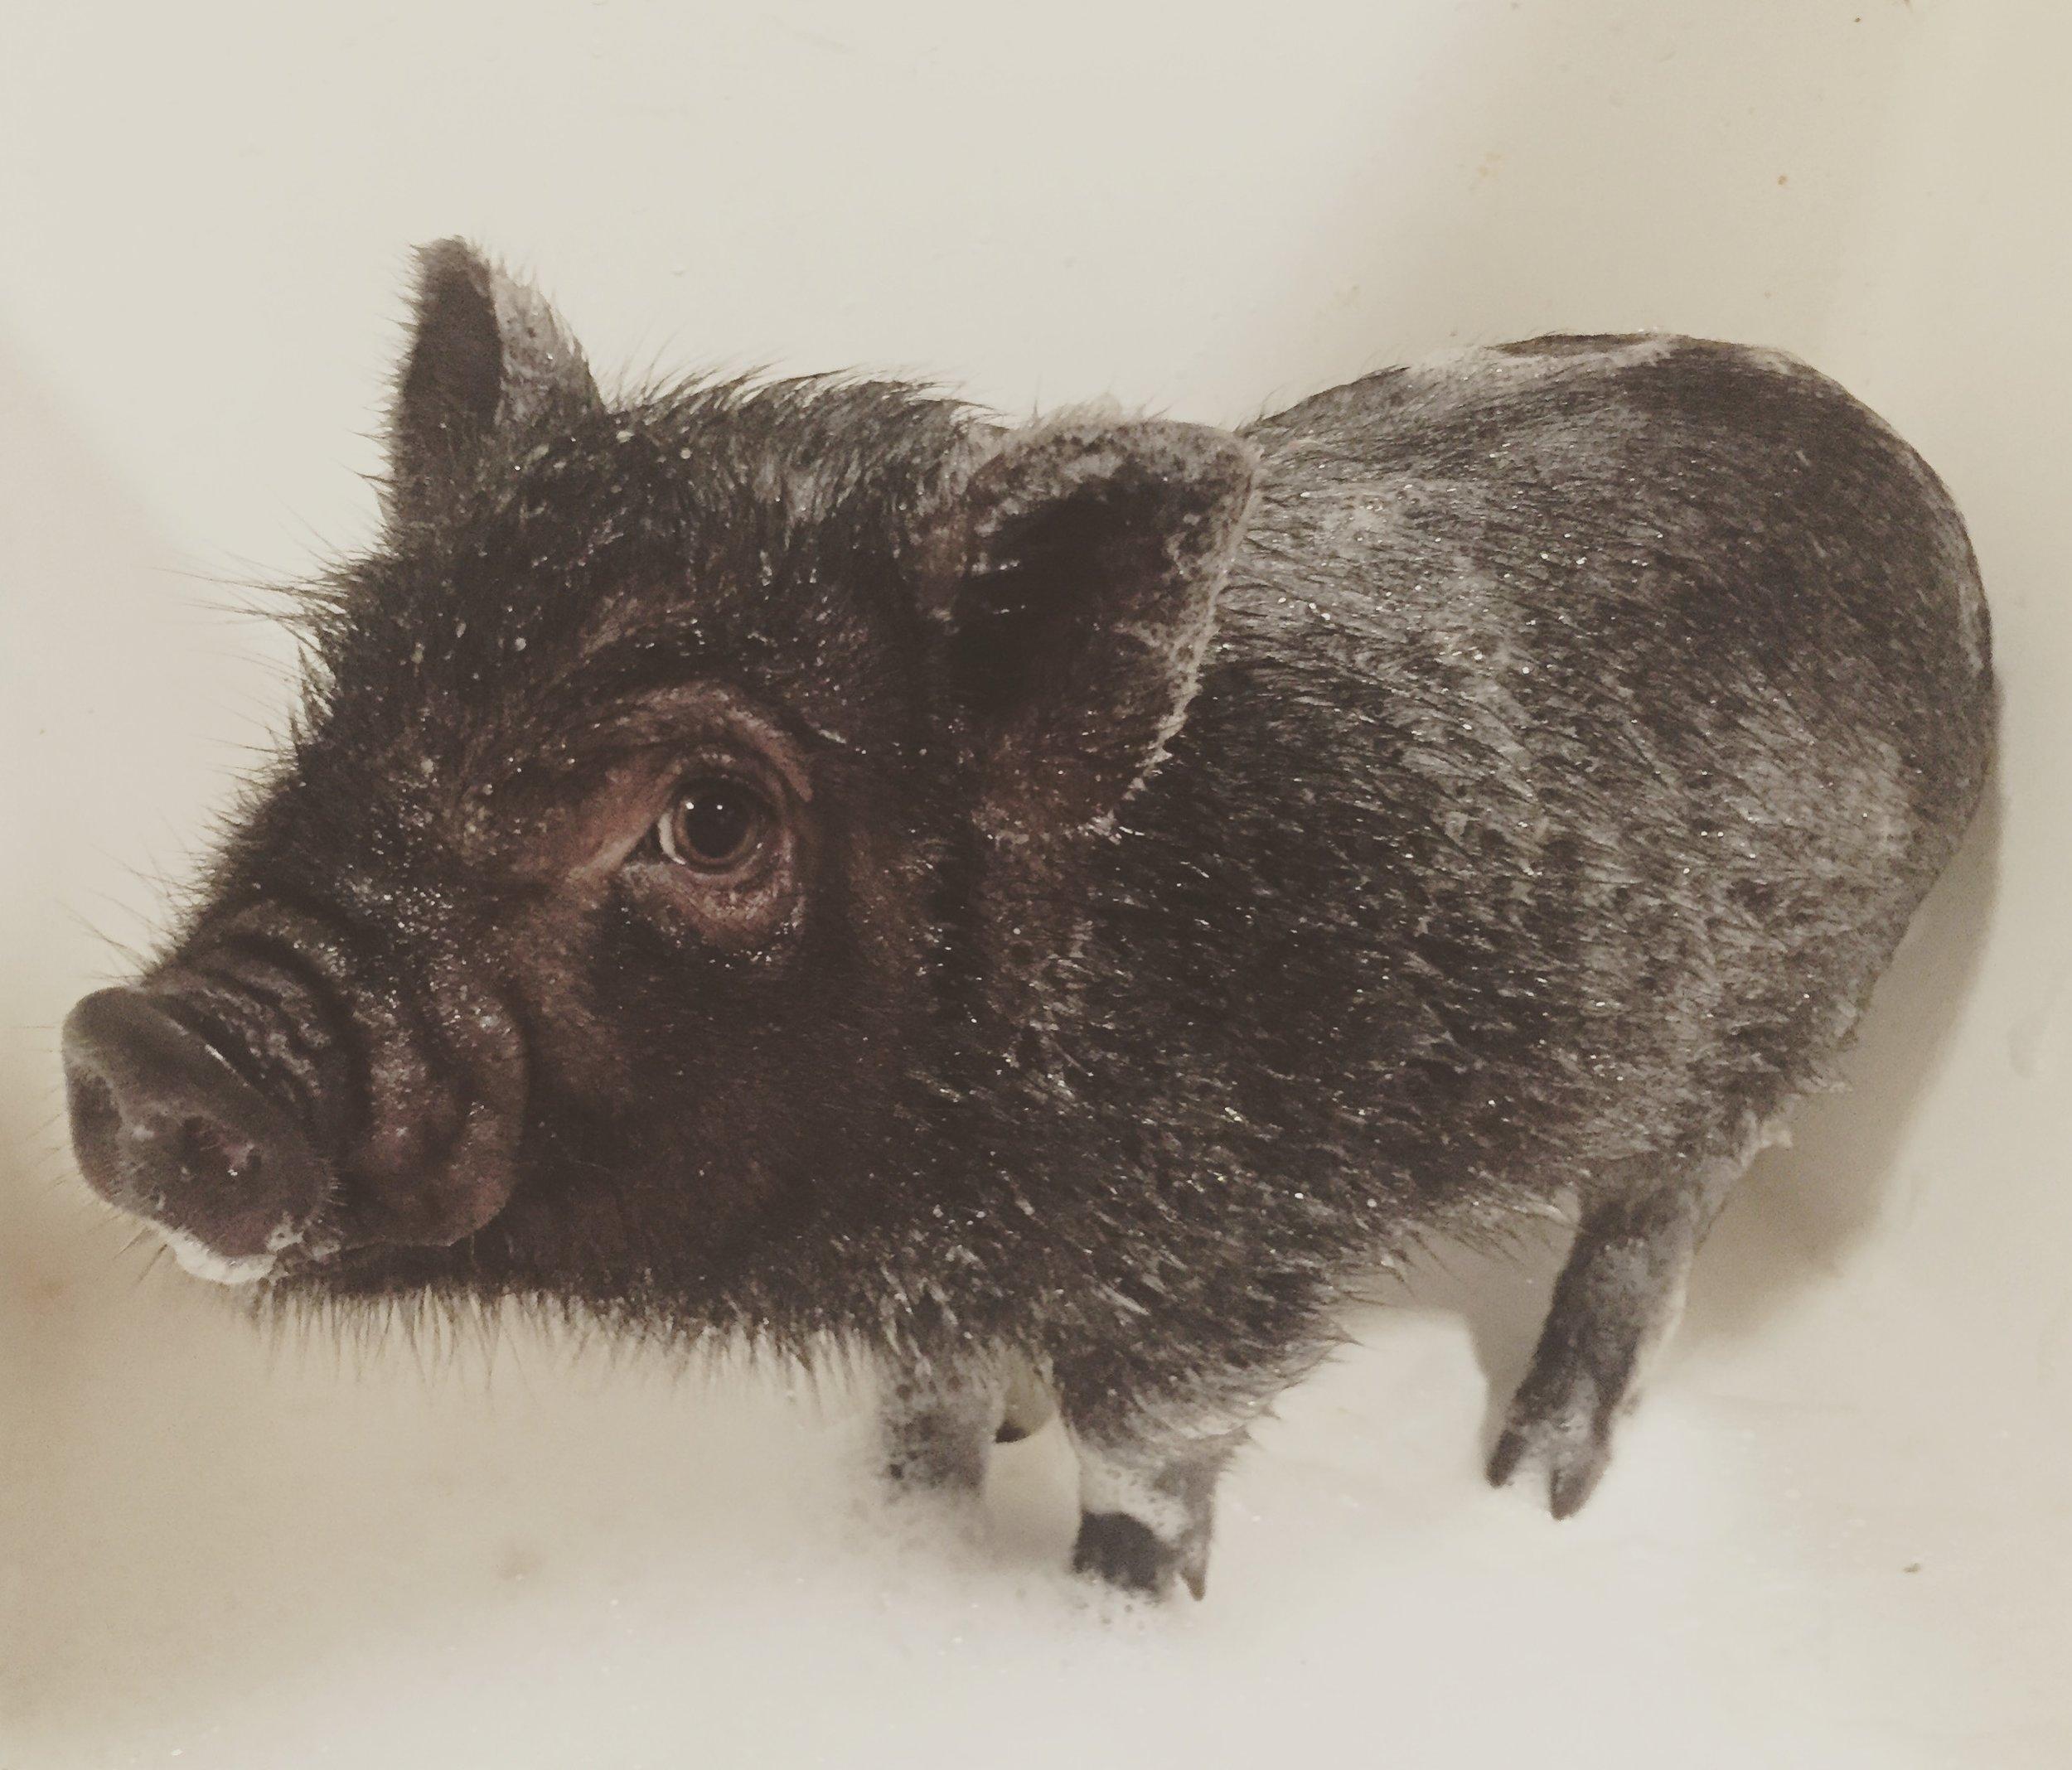 Norman having a bath!